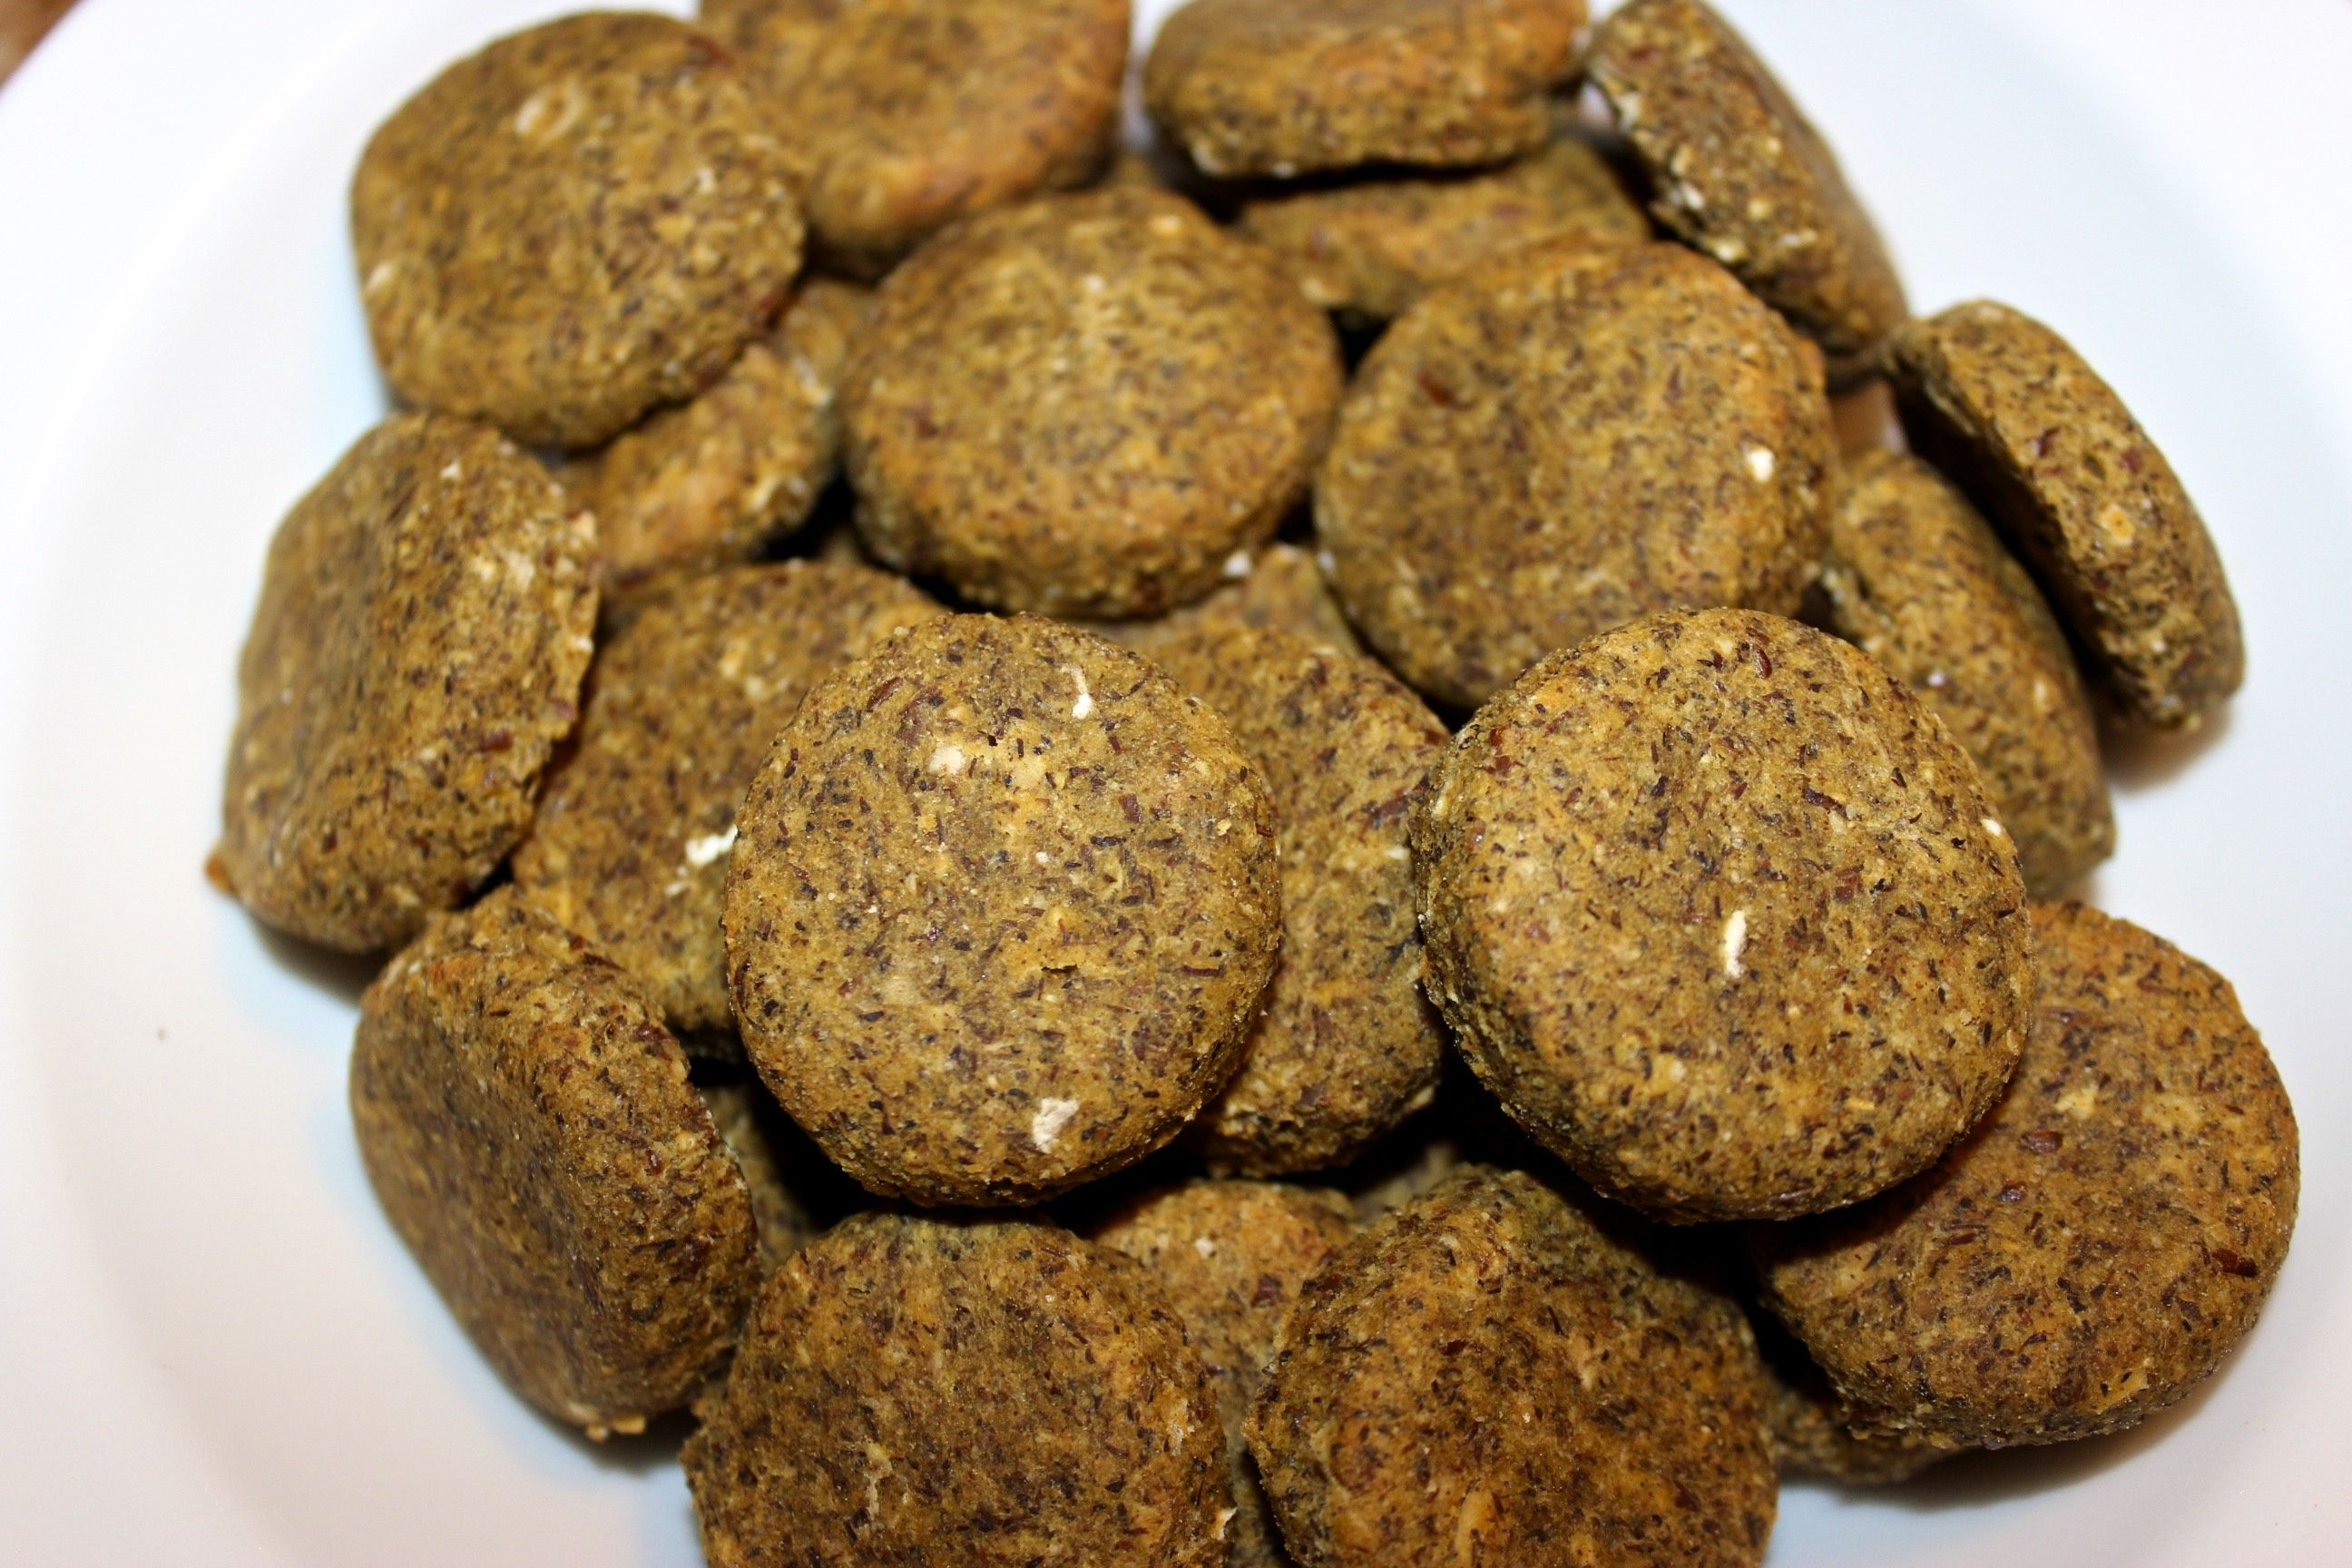 Sweet Potato & Flax Meal. Organic Handmade DairyFree